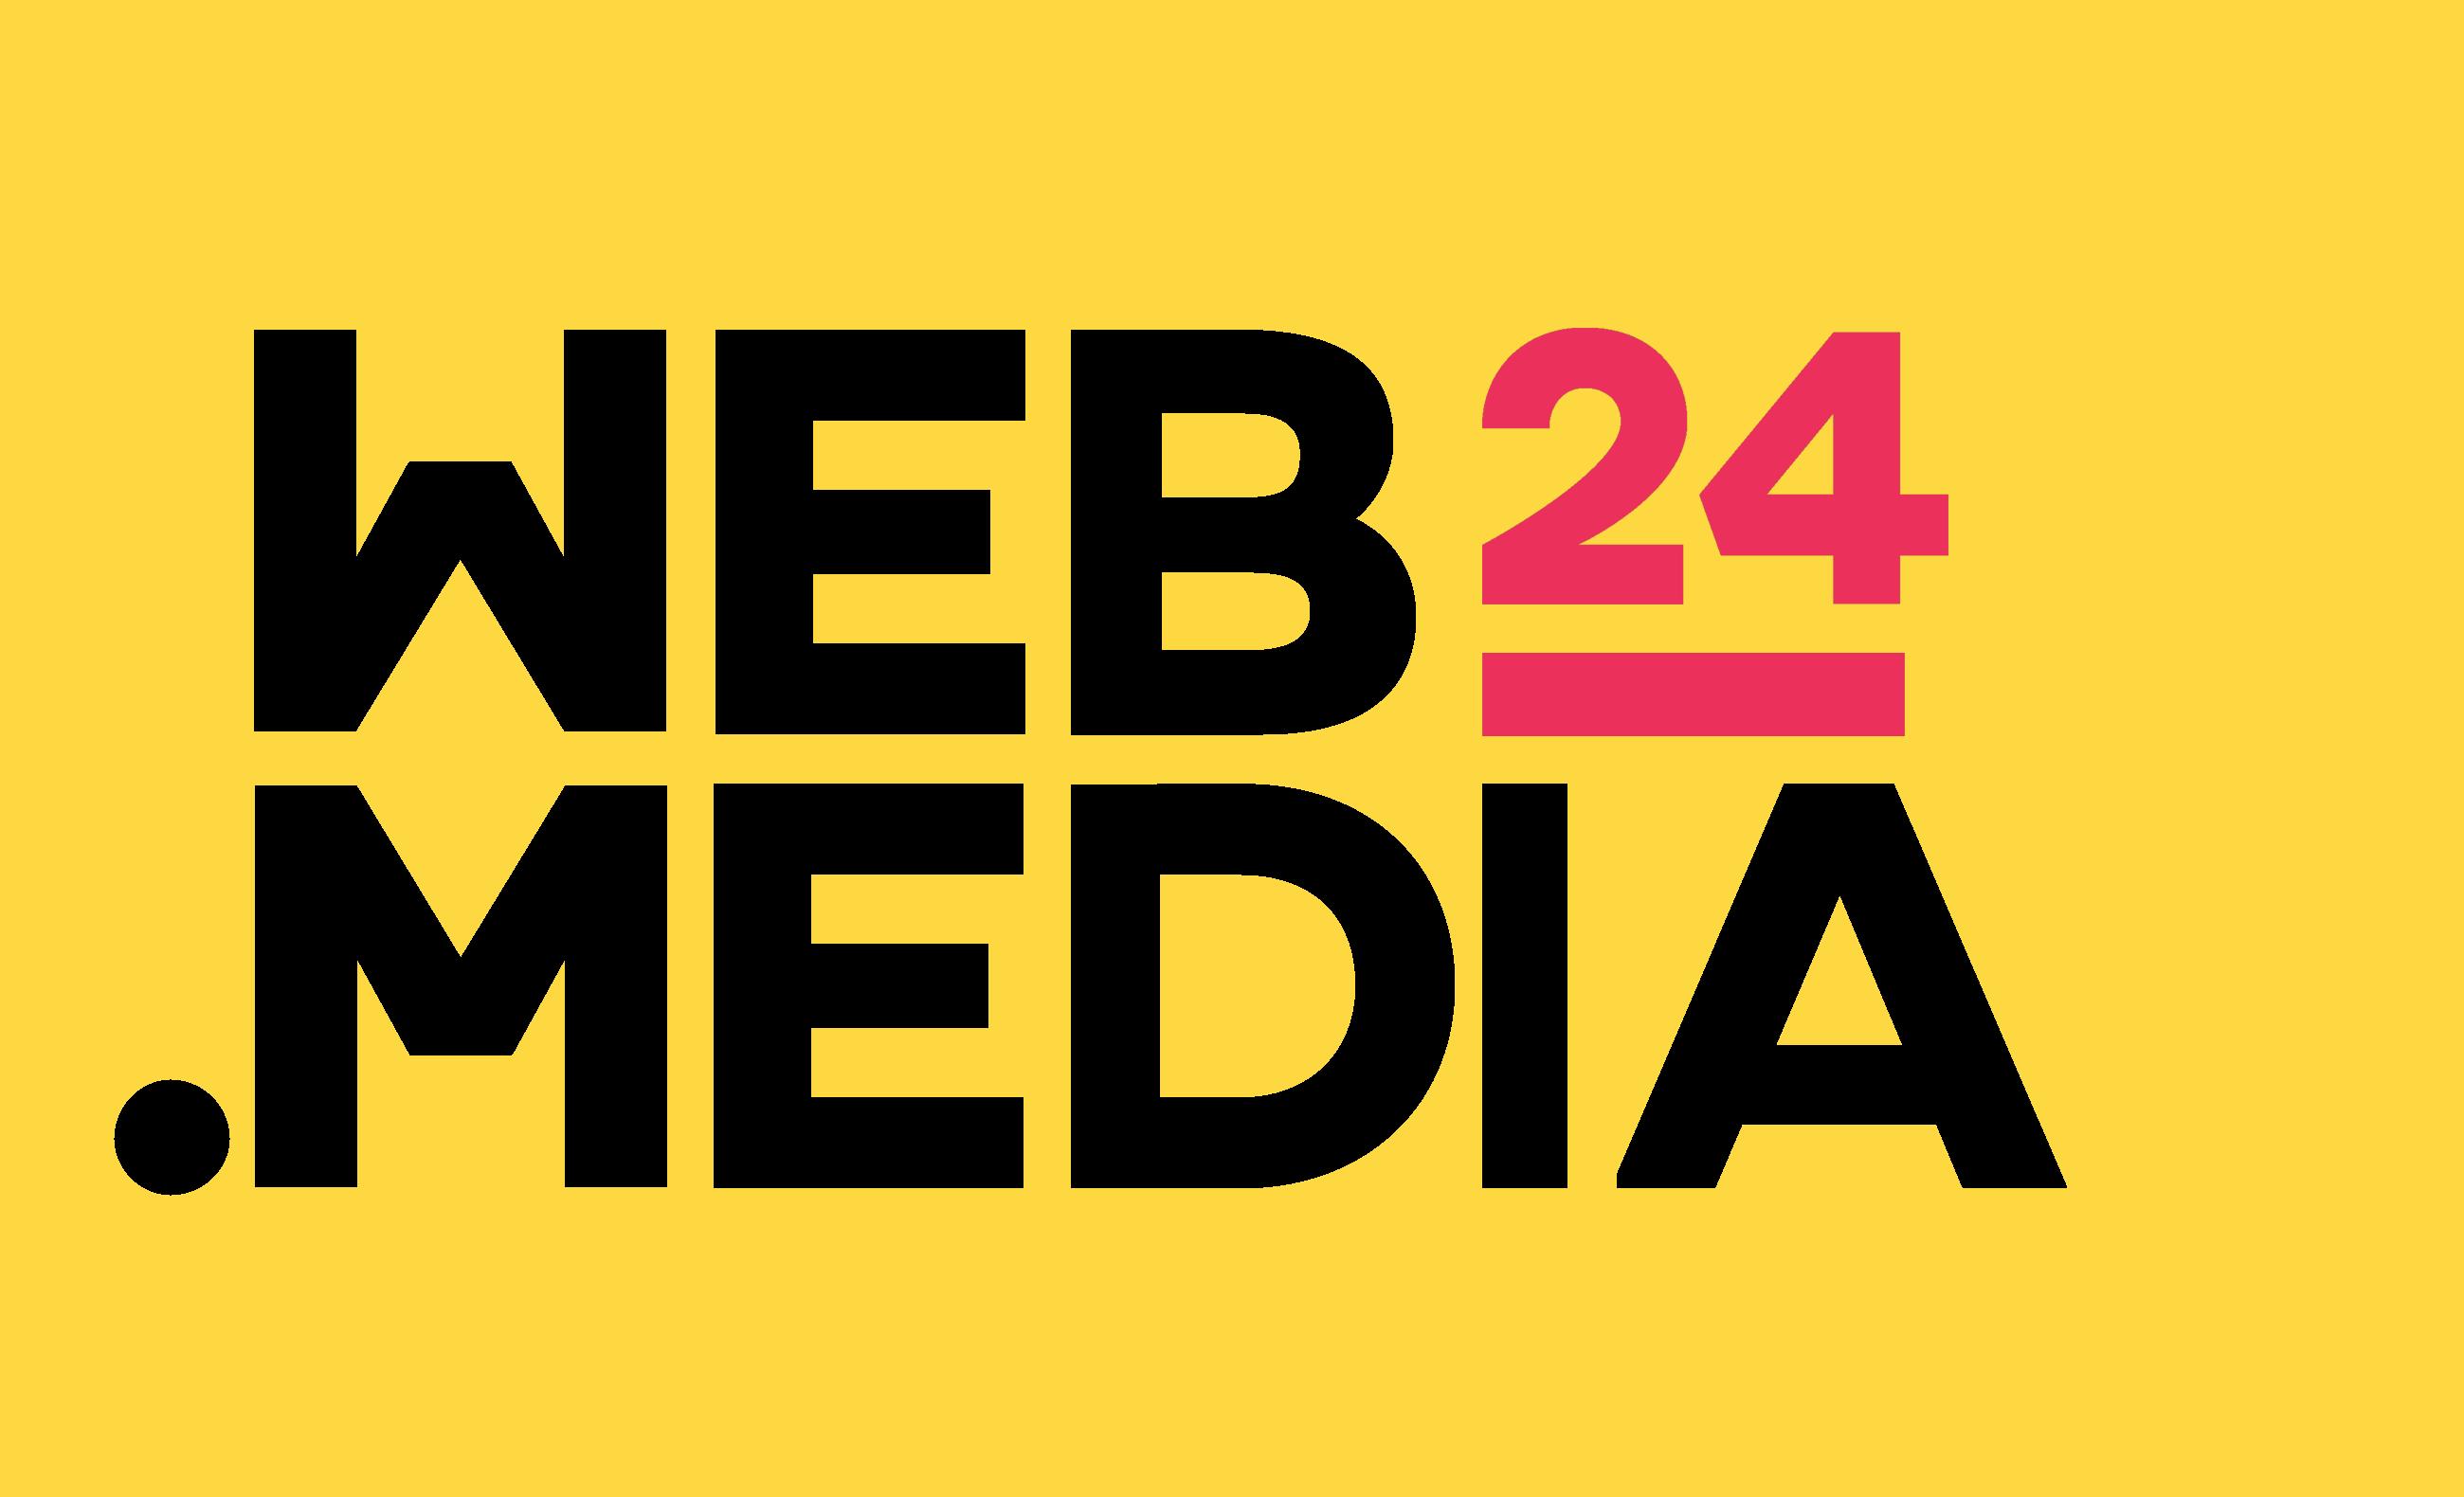 web24.media - The Nonstop digital factory